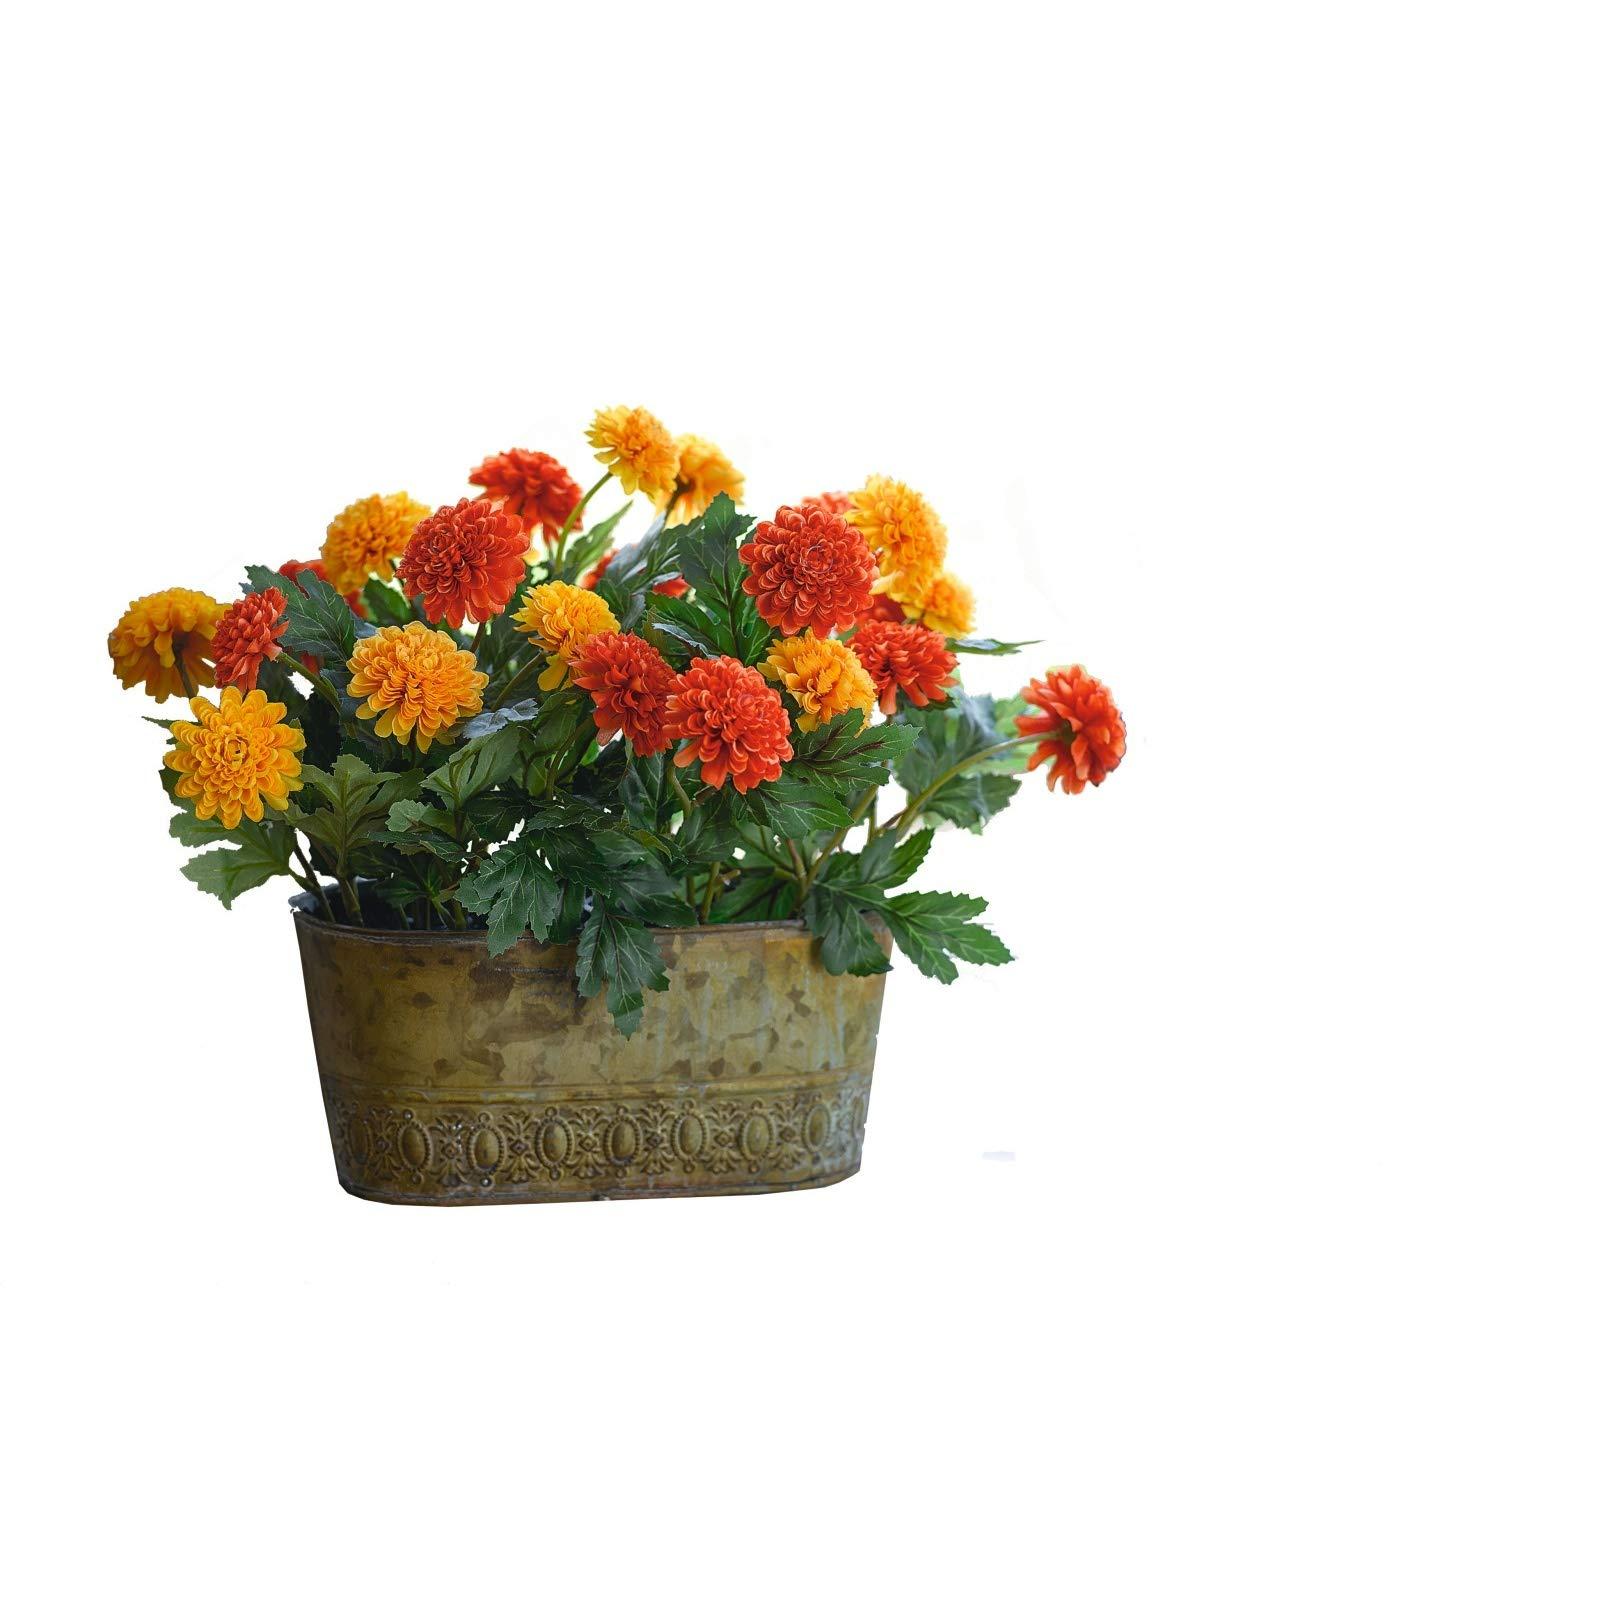 Bloom Artificial Orange Red Marigold T Buy Online In Brunei At Desertcart